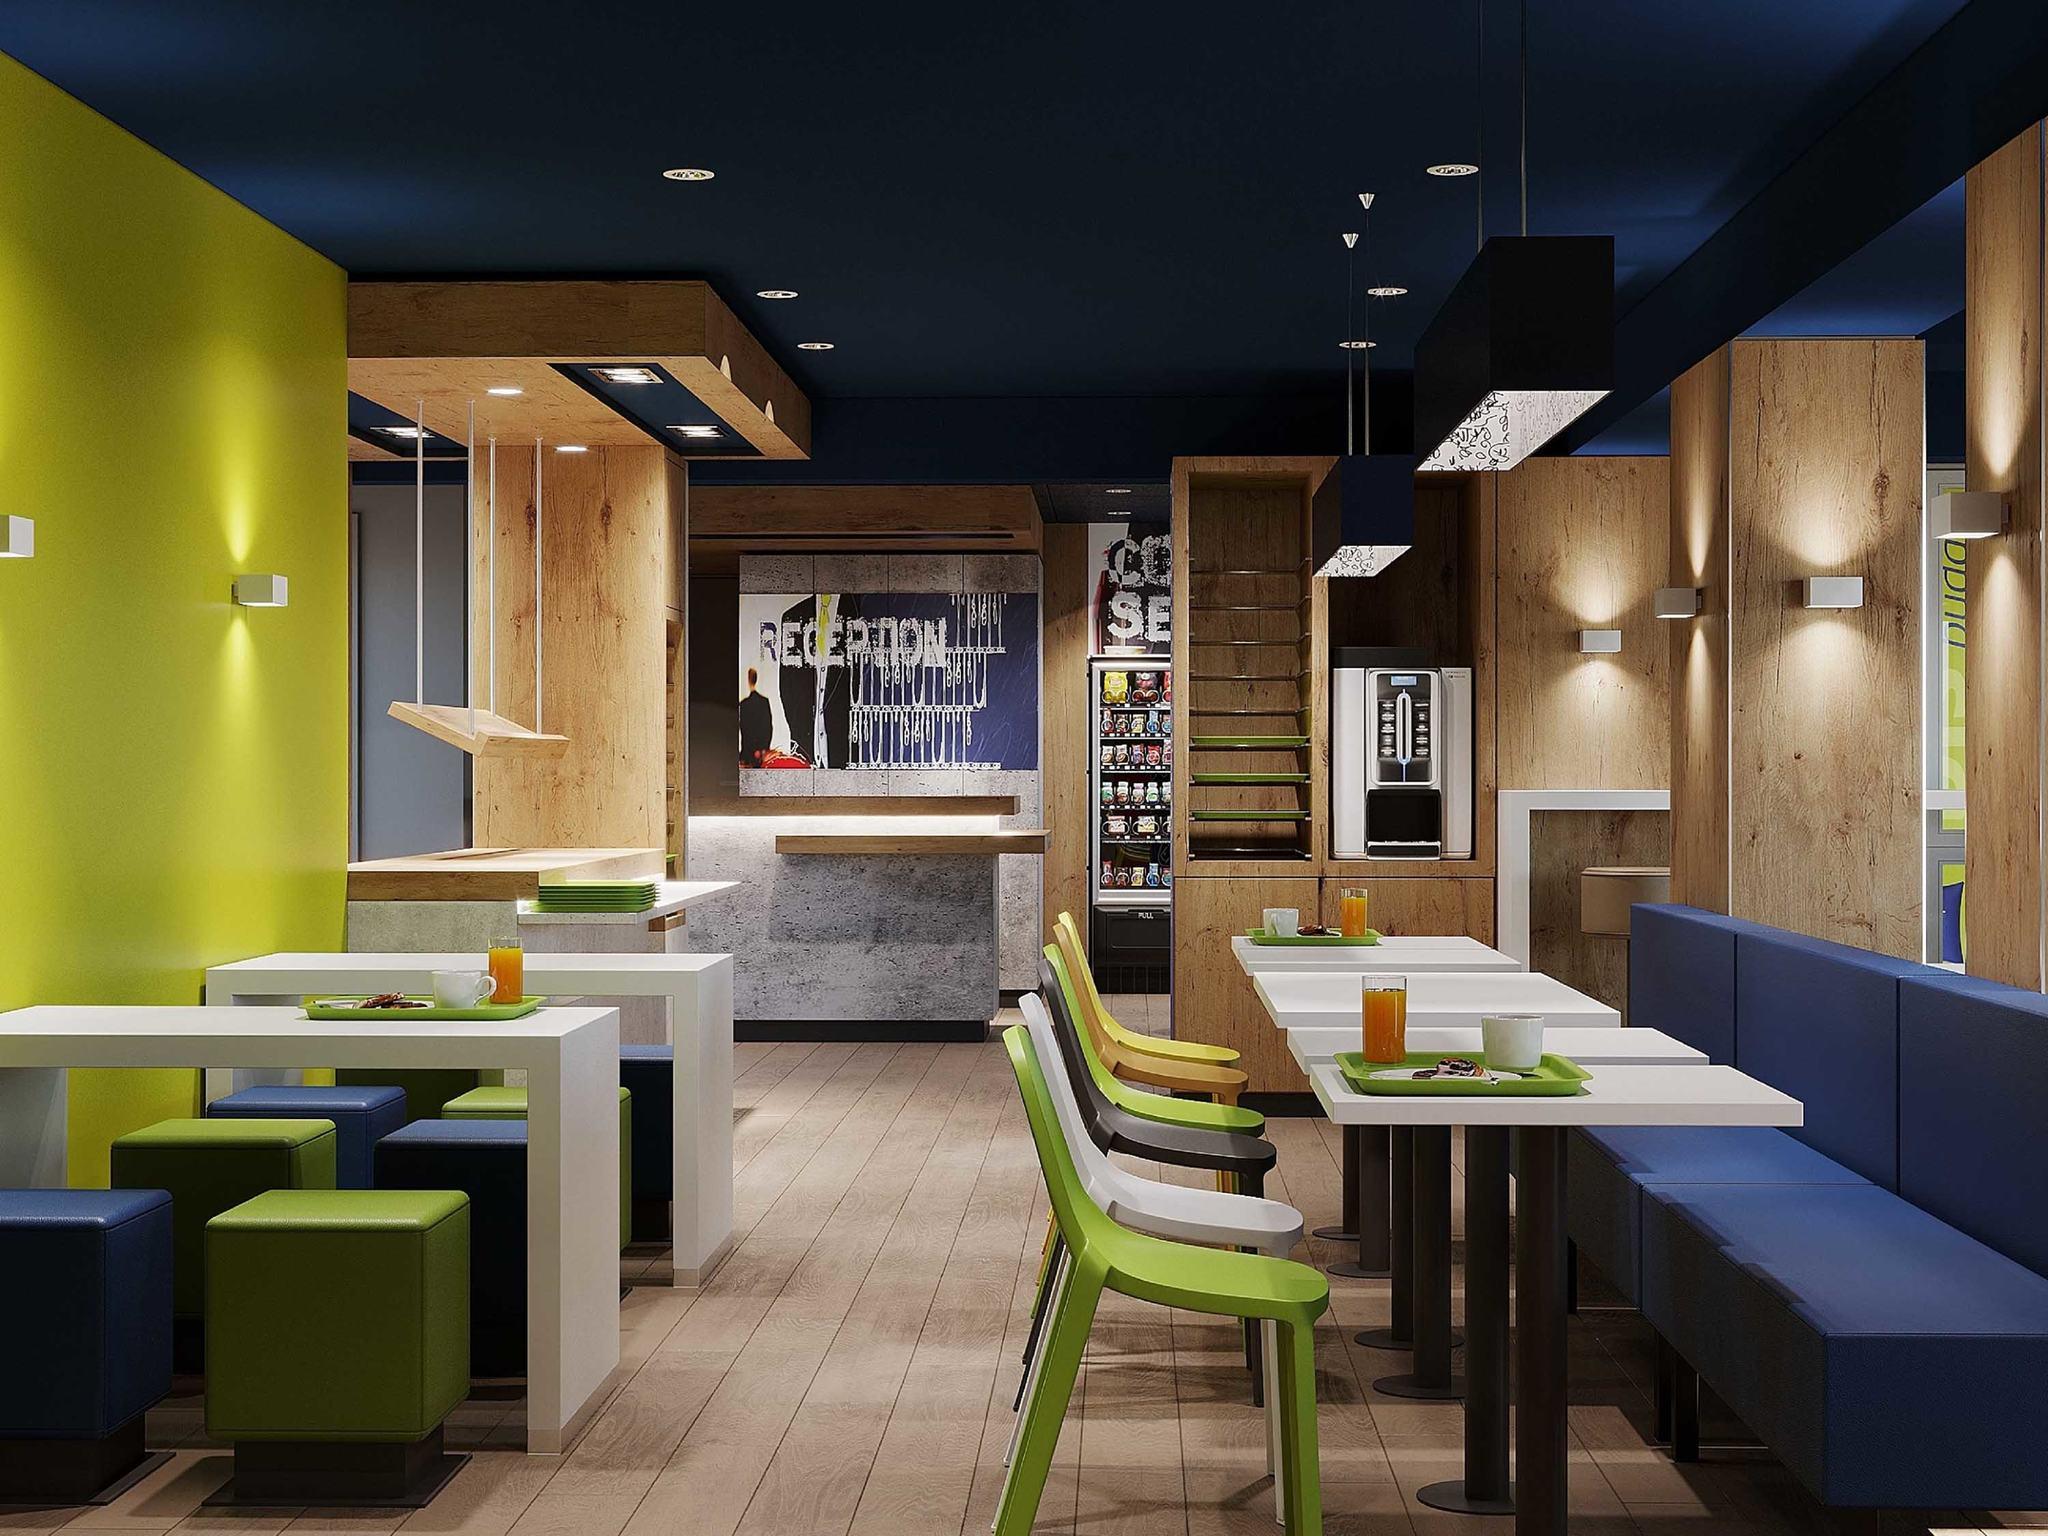 Hotel   Ibis Budget Poitiers Nord Futuroscope Inspirations De Conception